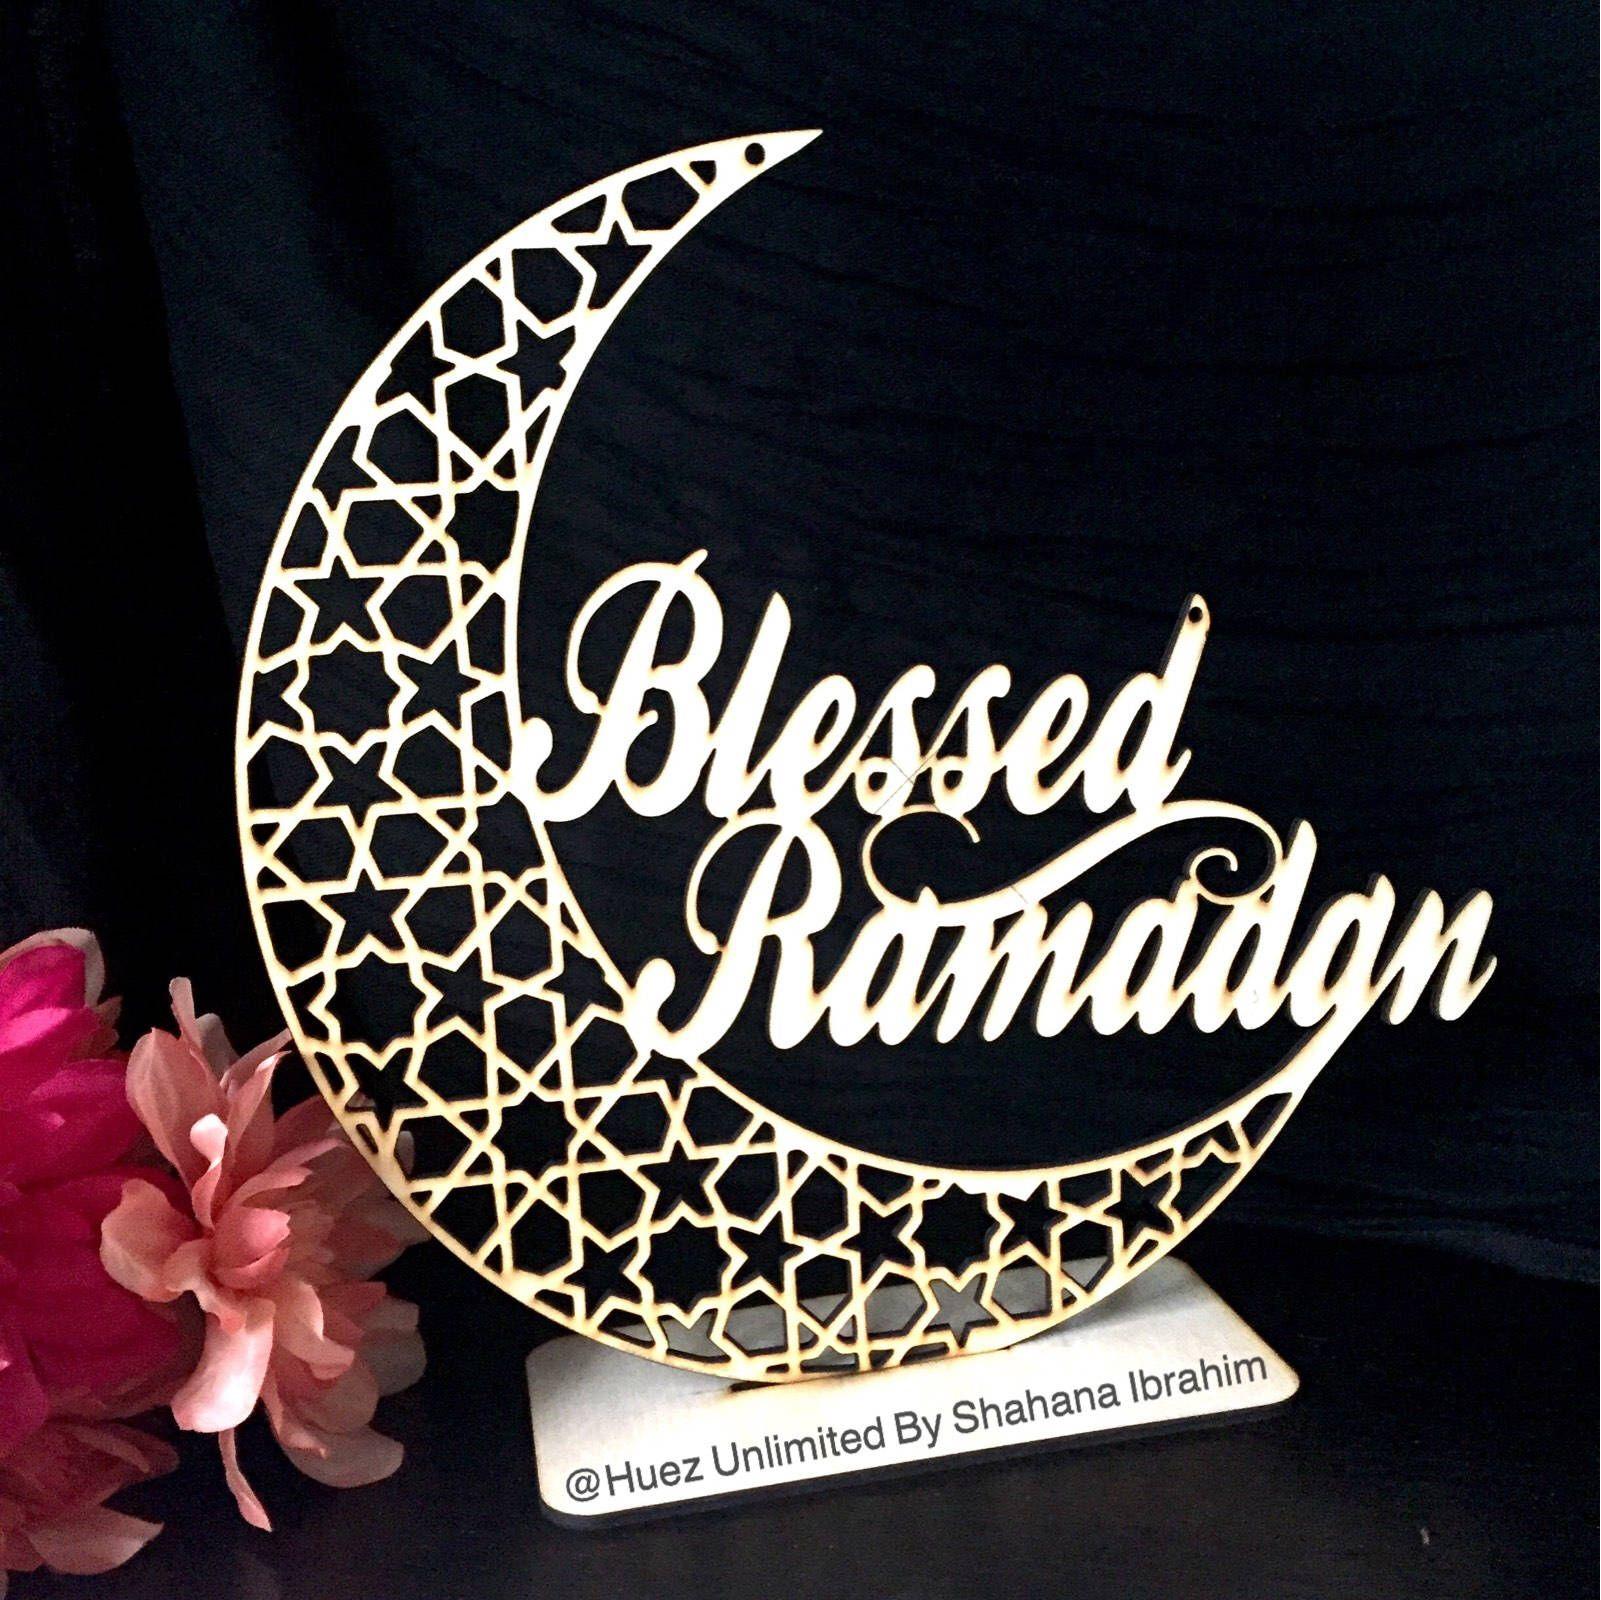 Best 1 Day Ramadan Decor - 043d332e0fe9ed9c24f0351237f8ebcf  Perfect Image Reference_40853.jpg